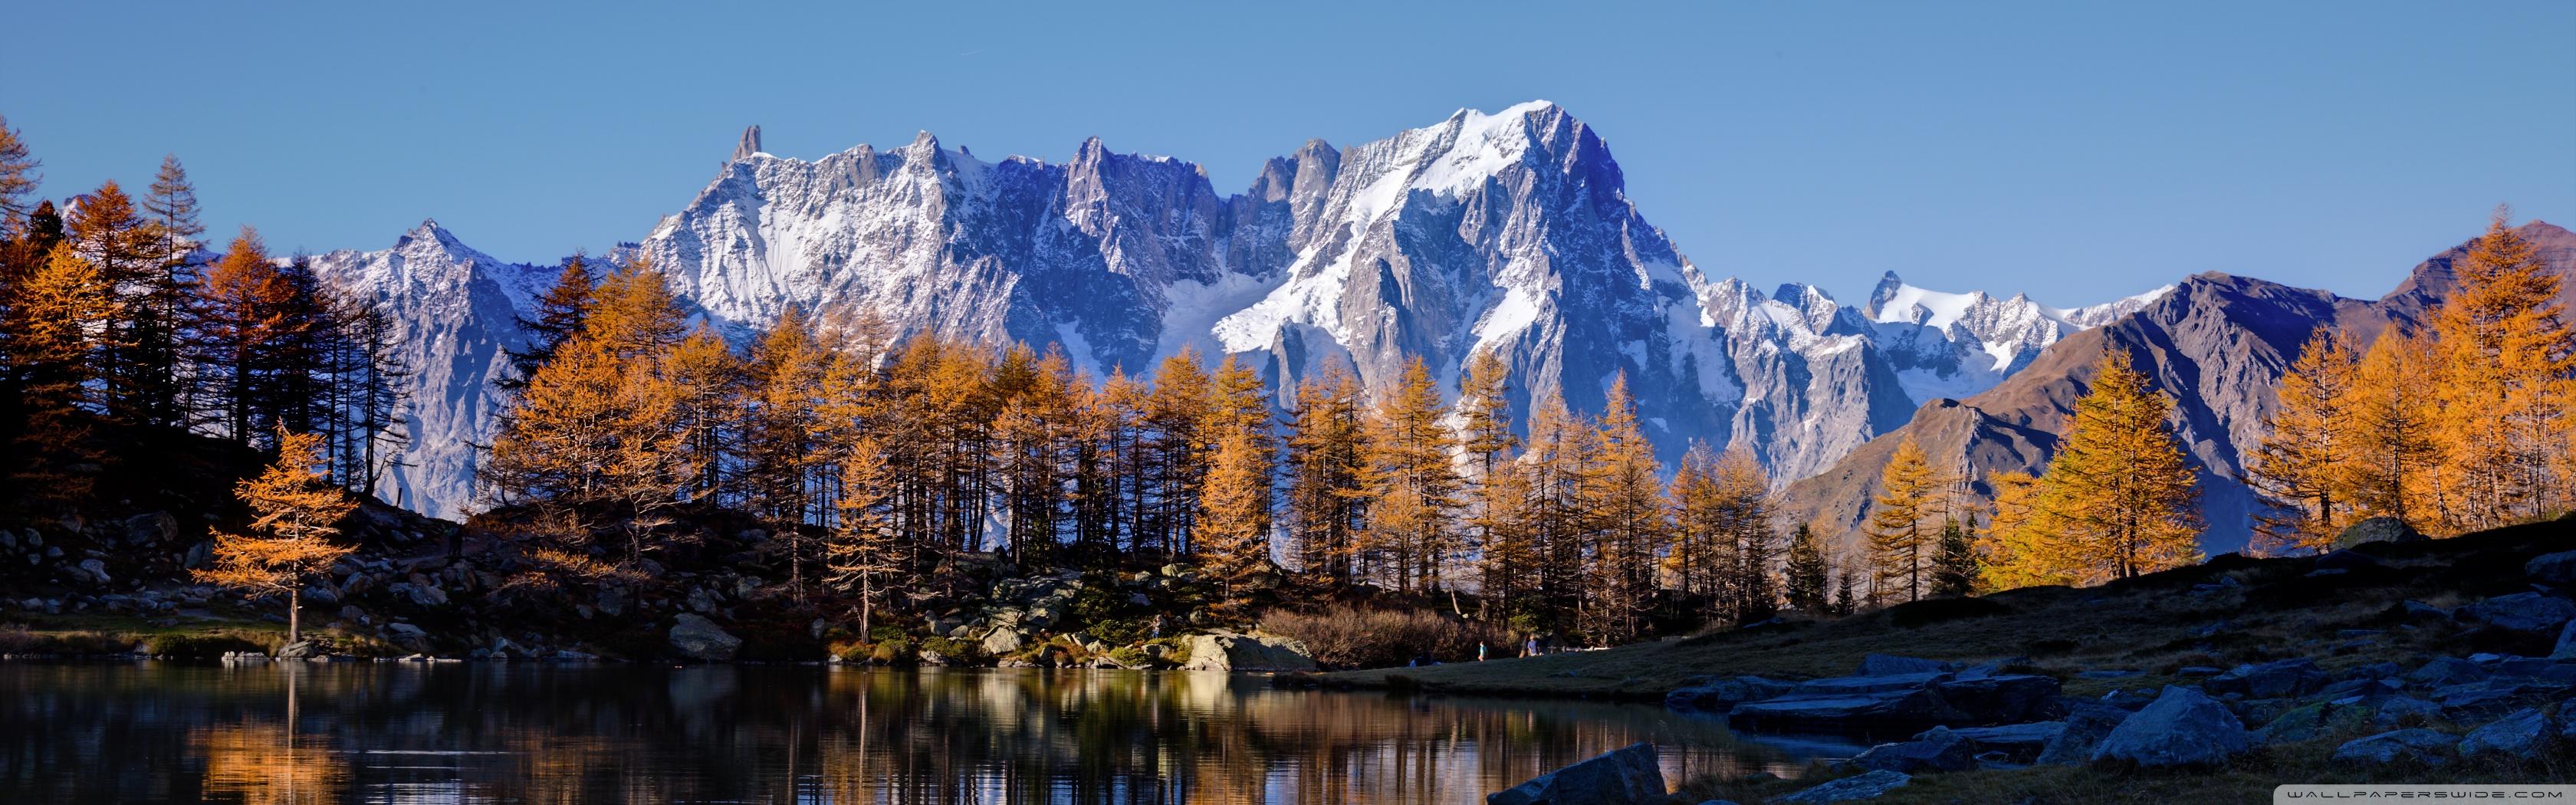 Fall Dual Monitor Wallpaper Mont Blanc Autumn 4k Hd Desktop Wallpaper For Dual